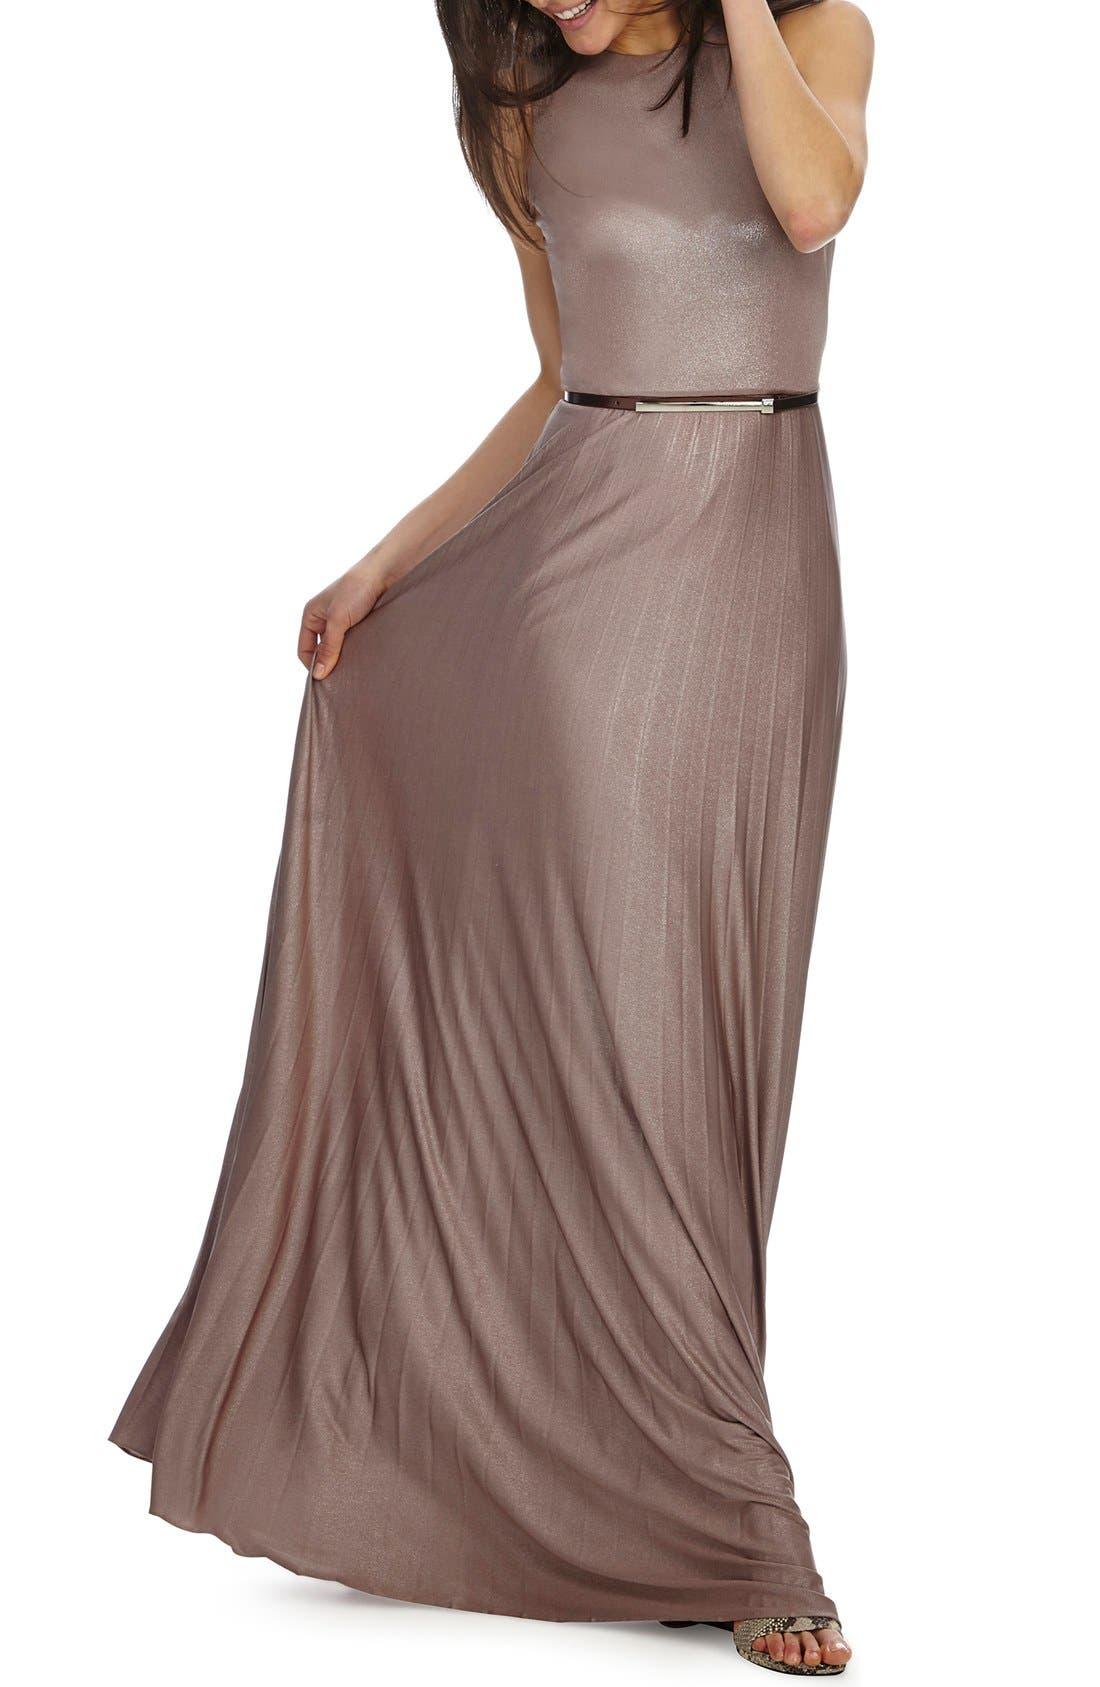 Alternate Image 1 Selected - Donna Morgan Pleat Foil Knit Maxi Dress